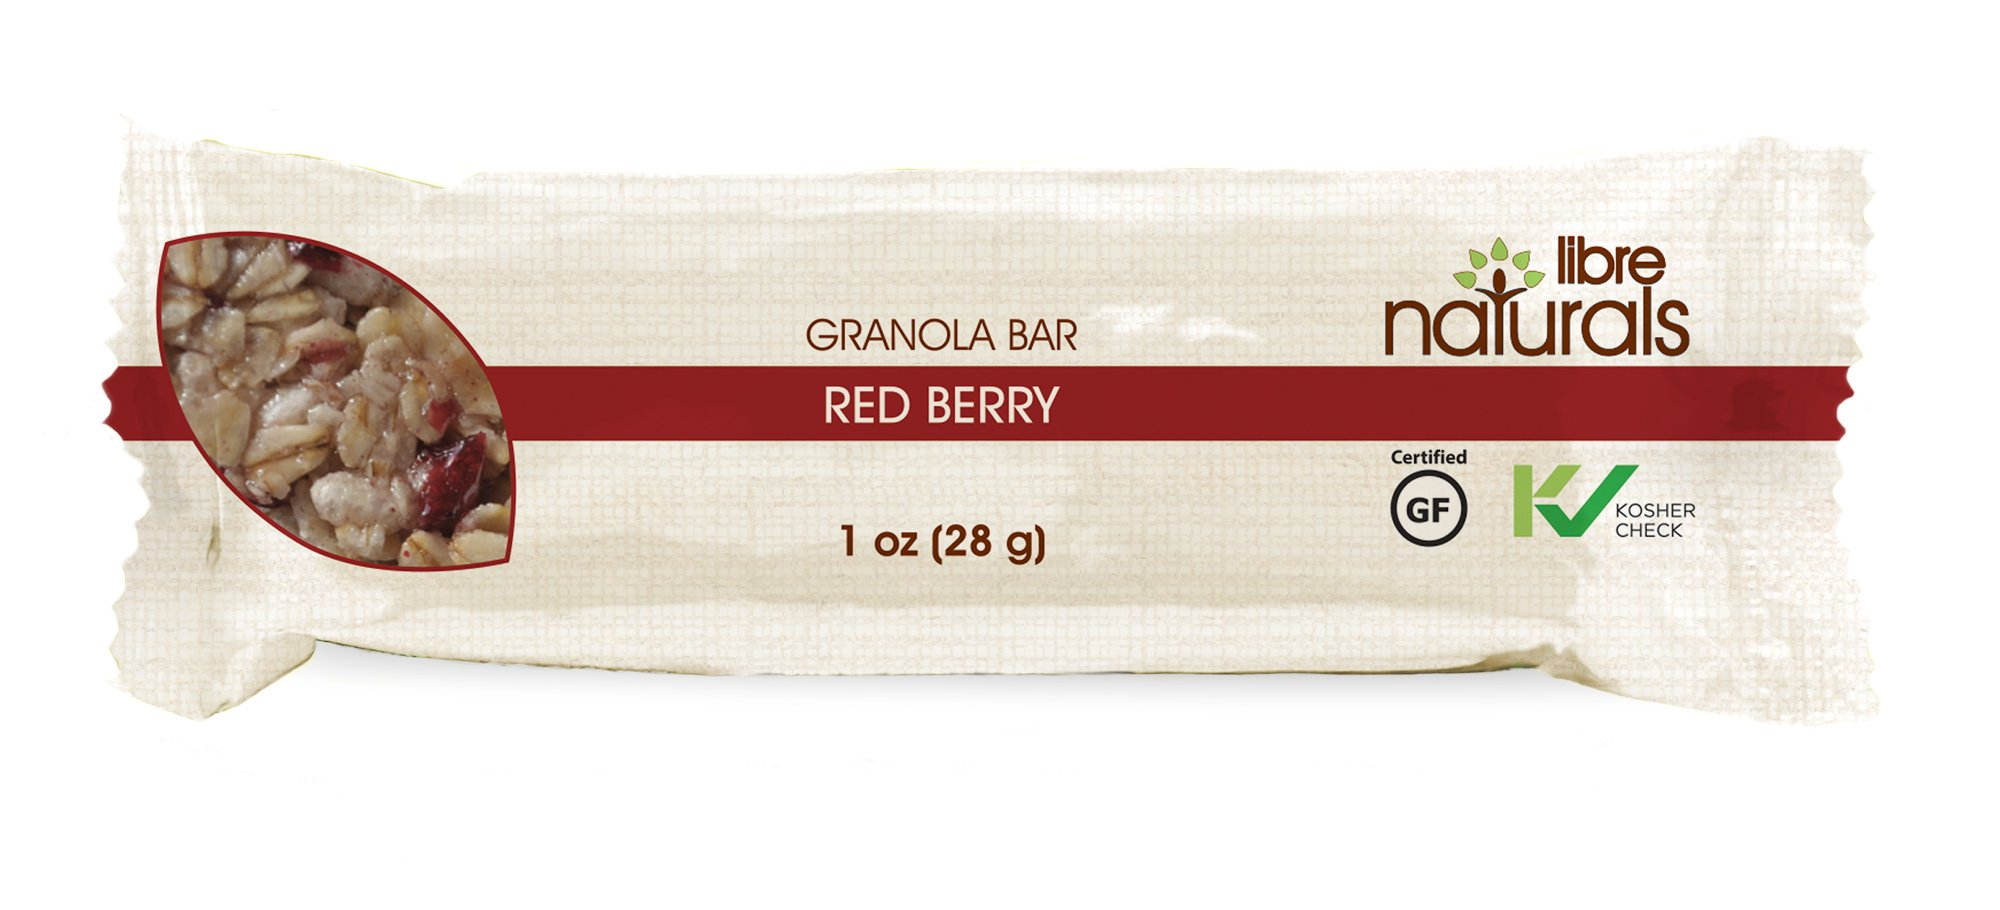 Nut Free, Gluten Free >> Red Berry Vegan Granola Bar - Libre Naturals, 28 gram, 100 Bar Bulk Case